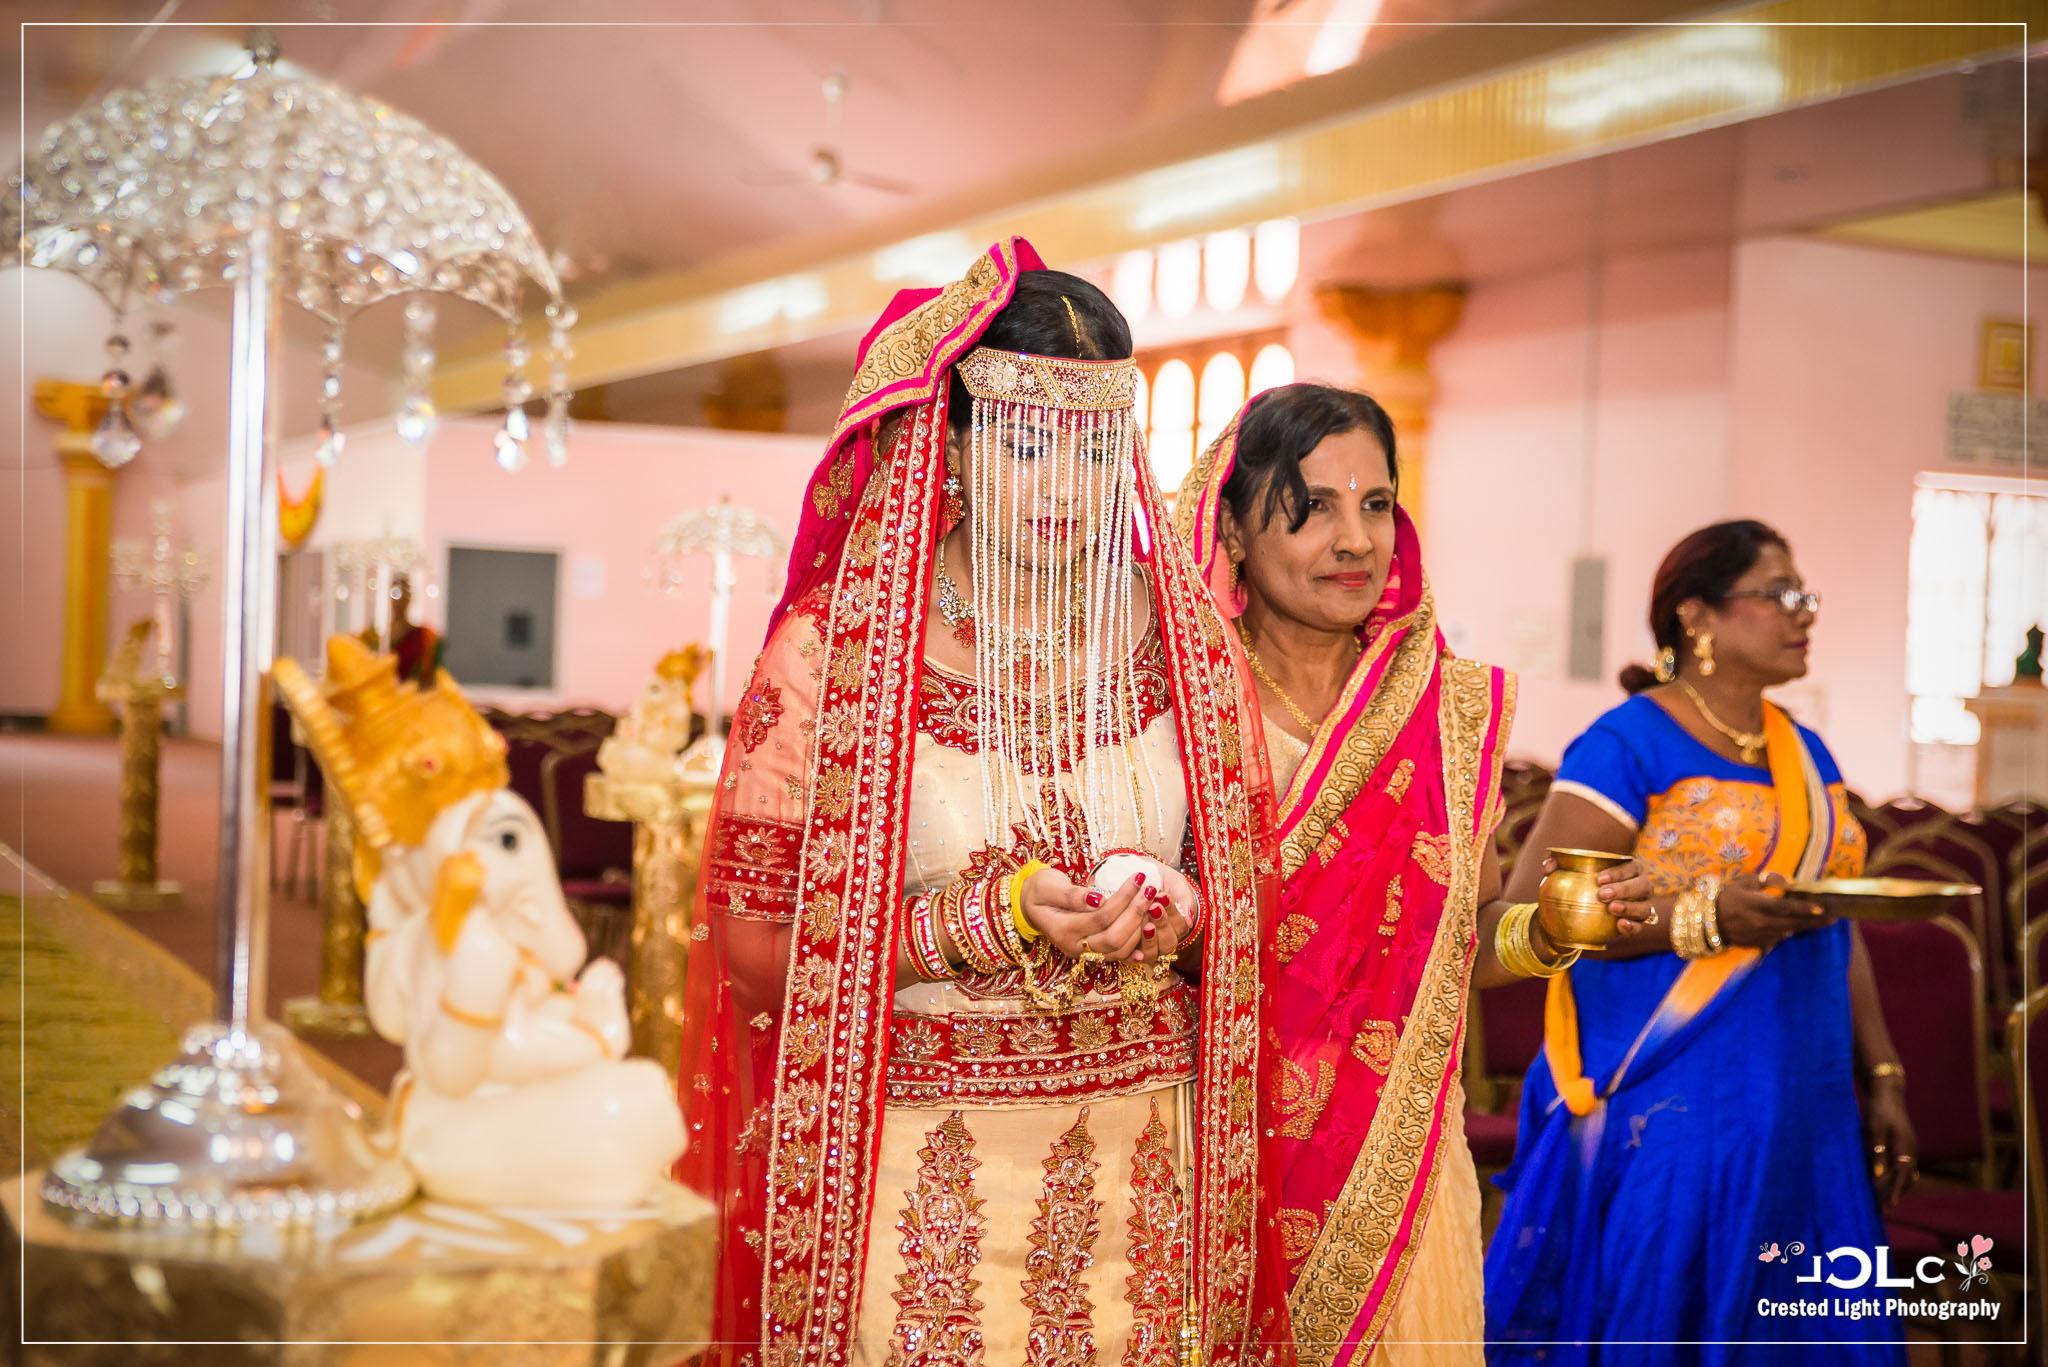 Hindu Wedding Ceremony at Sri Dattatreya Temple and Hanuman Murti in Carapichaima Trinidad